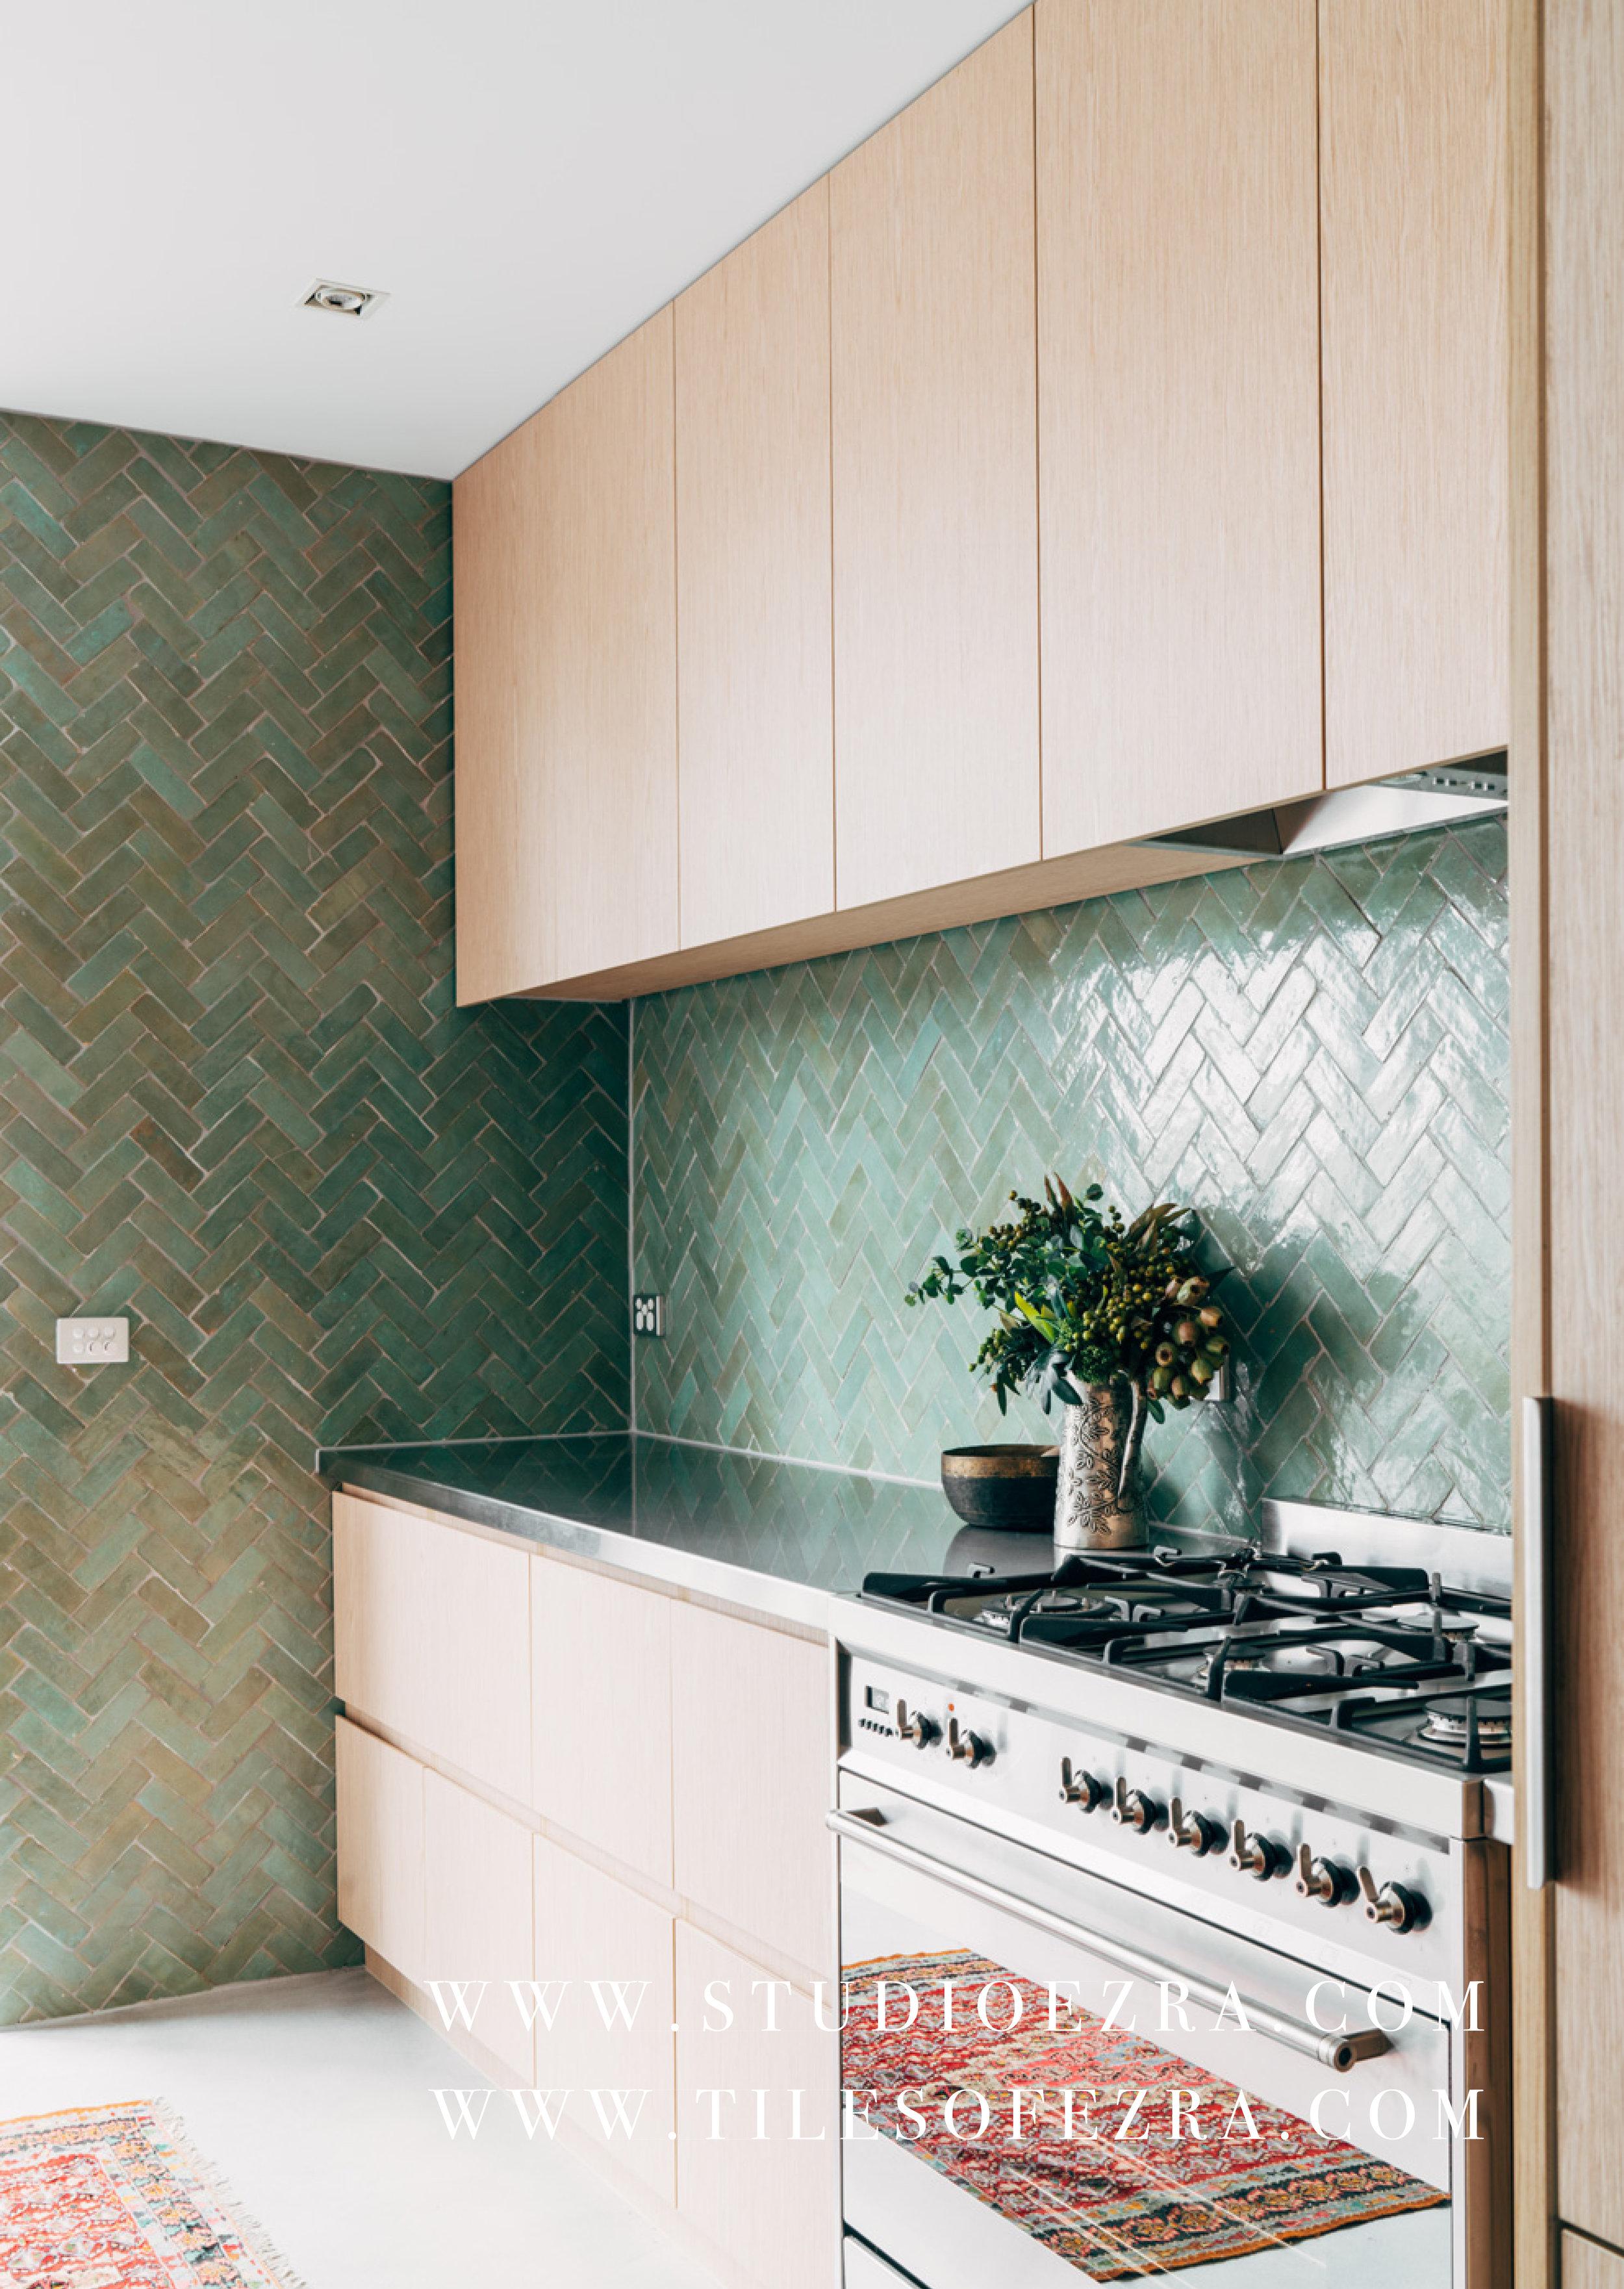 Studio Ezra design_Tiles of Ezra FL006 Aqua Moroccan Bejmat splashback B.jpg